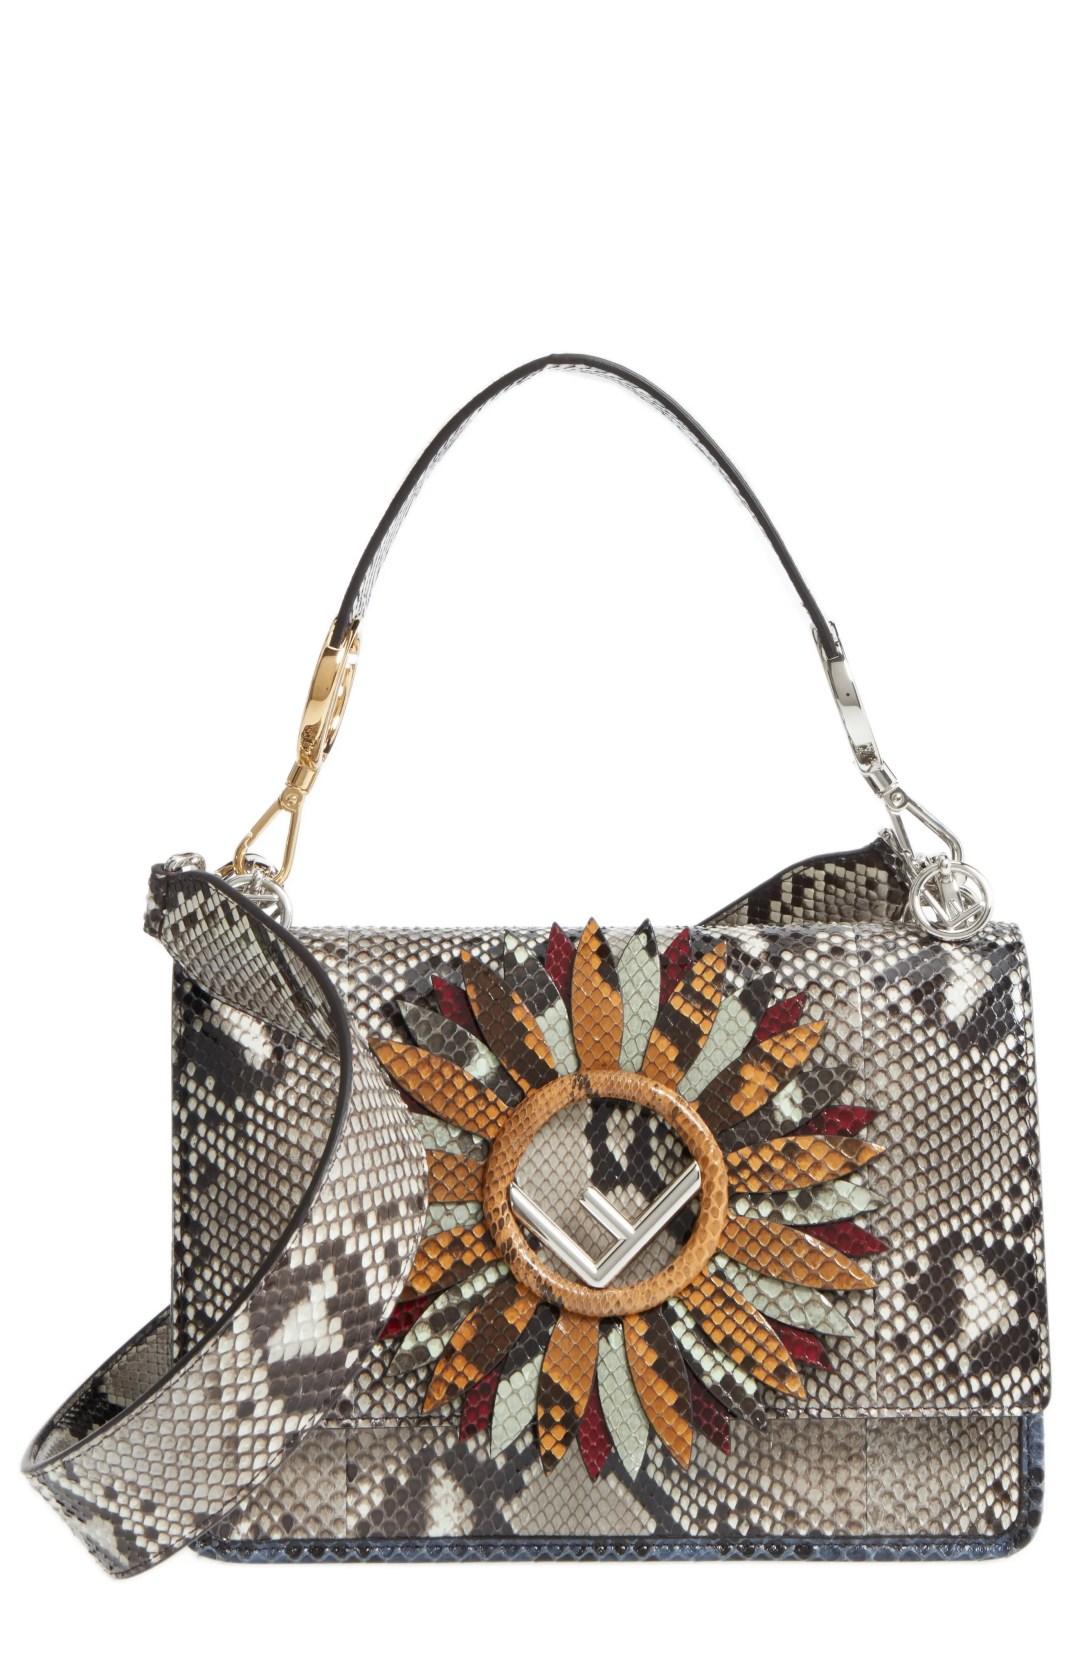 80c683d26cf5 Fendi Kan I Daisy Logo Genuine Python Shoulder Bag – – NORDSTROM.com –   5